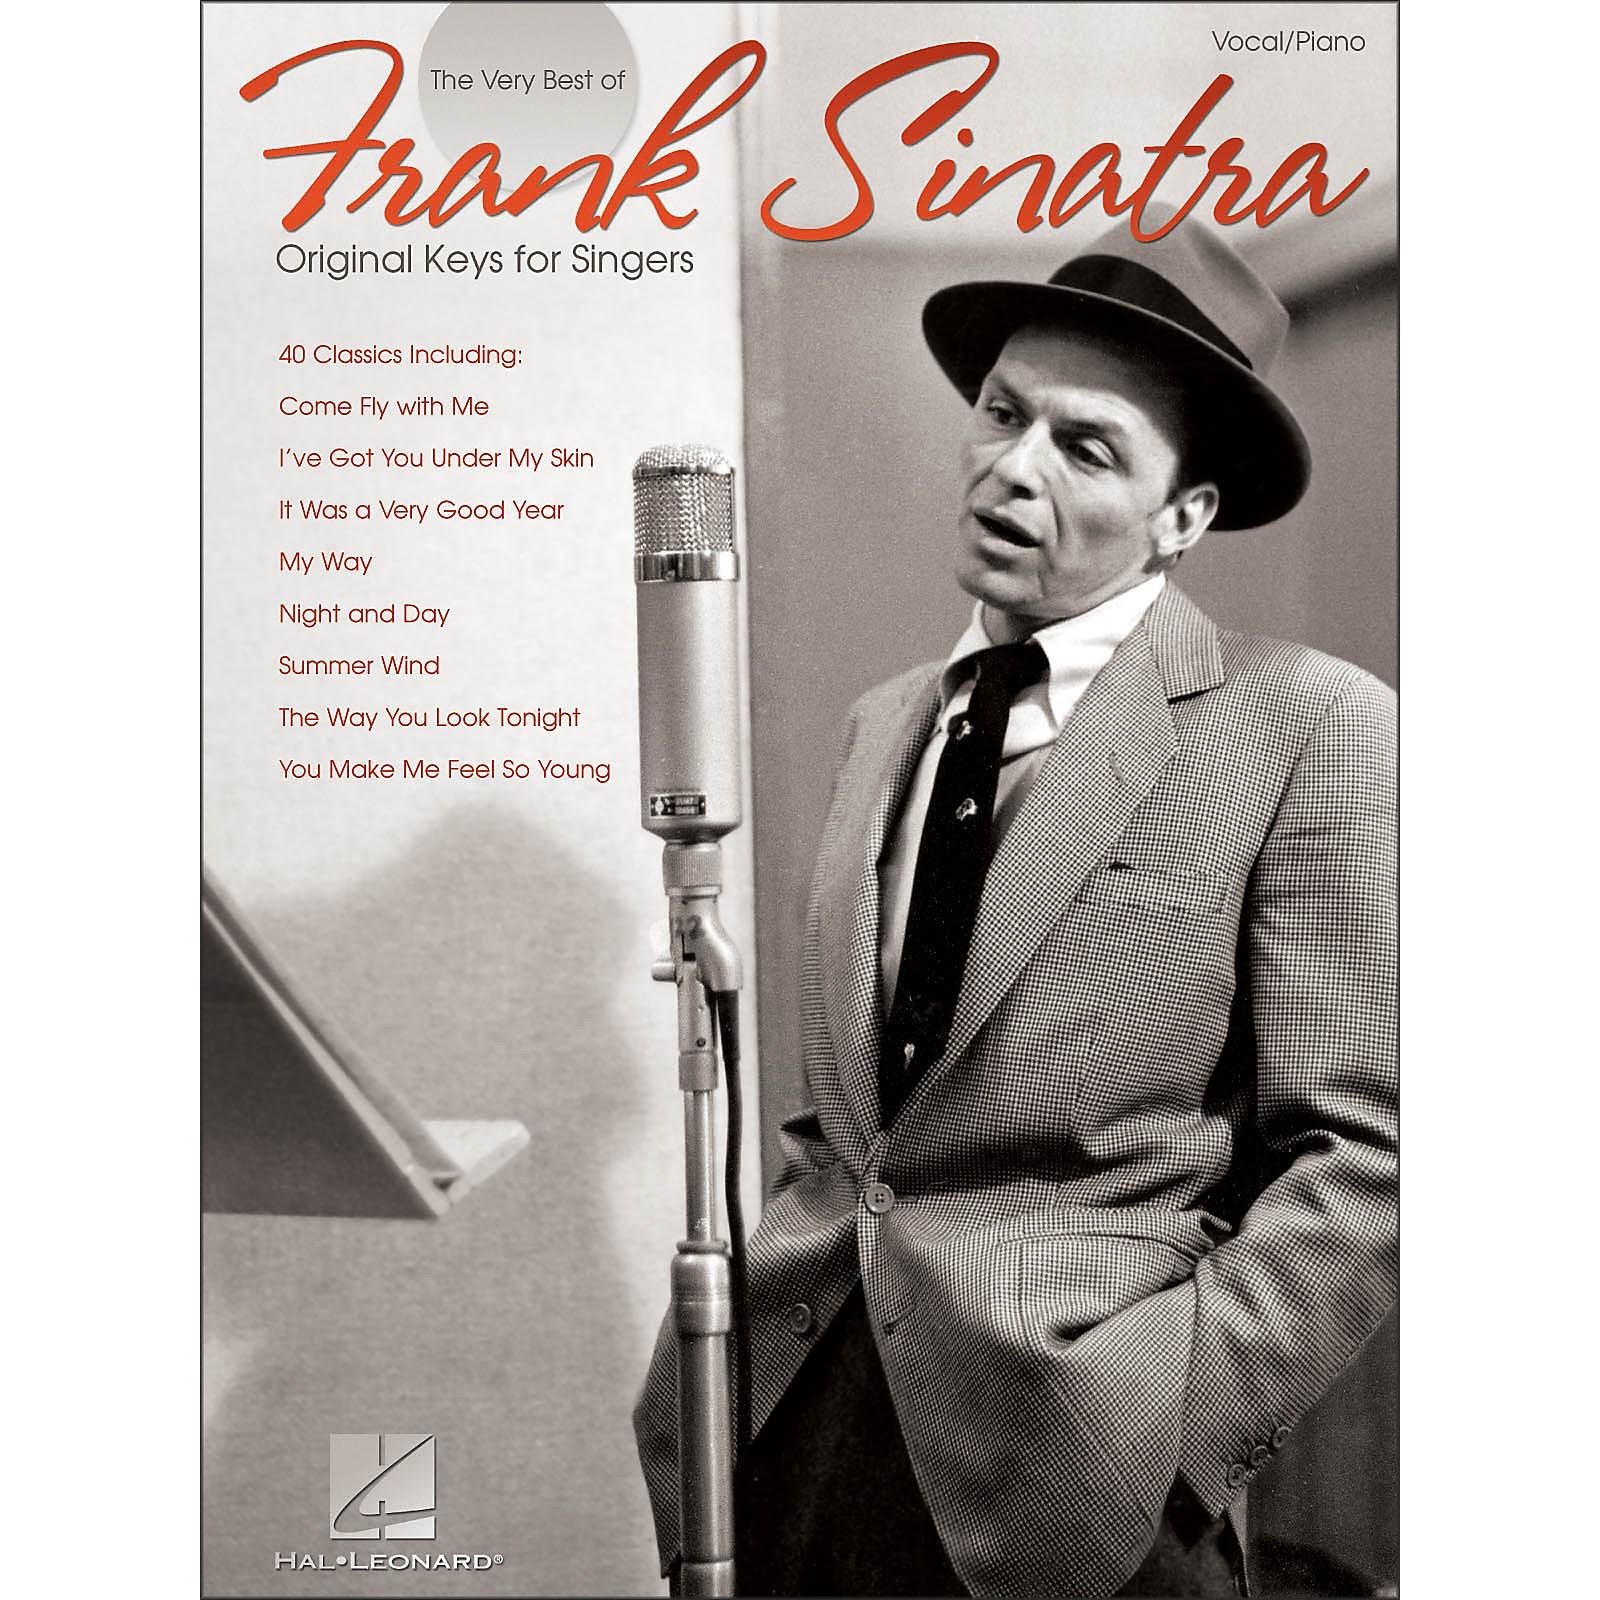 Hal Leonard Frank Sinatra - The Very Best Original Keys for Singers Vocal / Piano